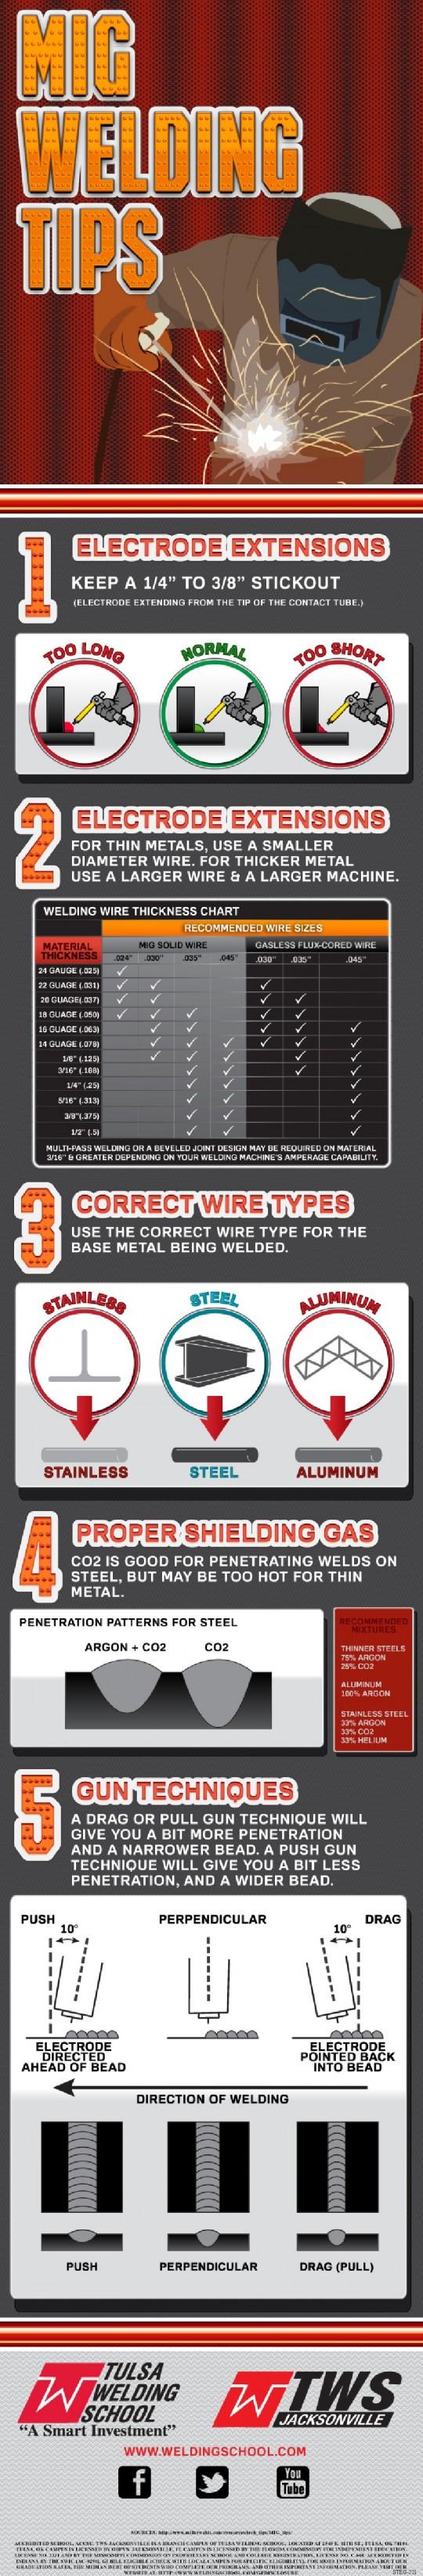 Mig-Welding-Tips-Infographic-Chart